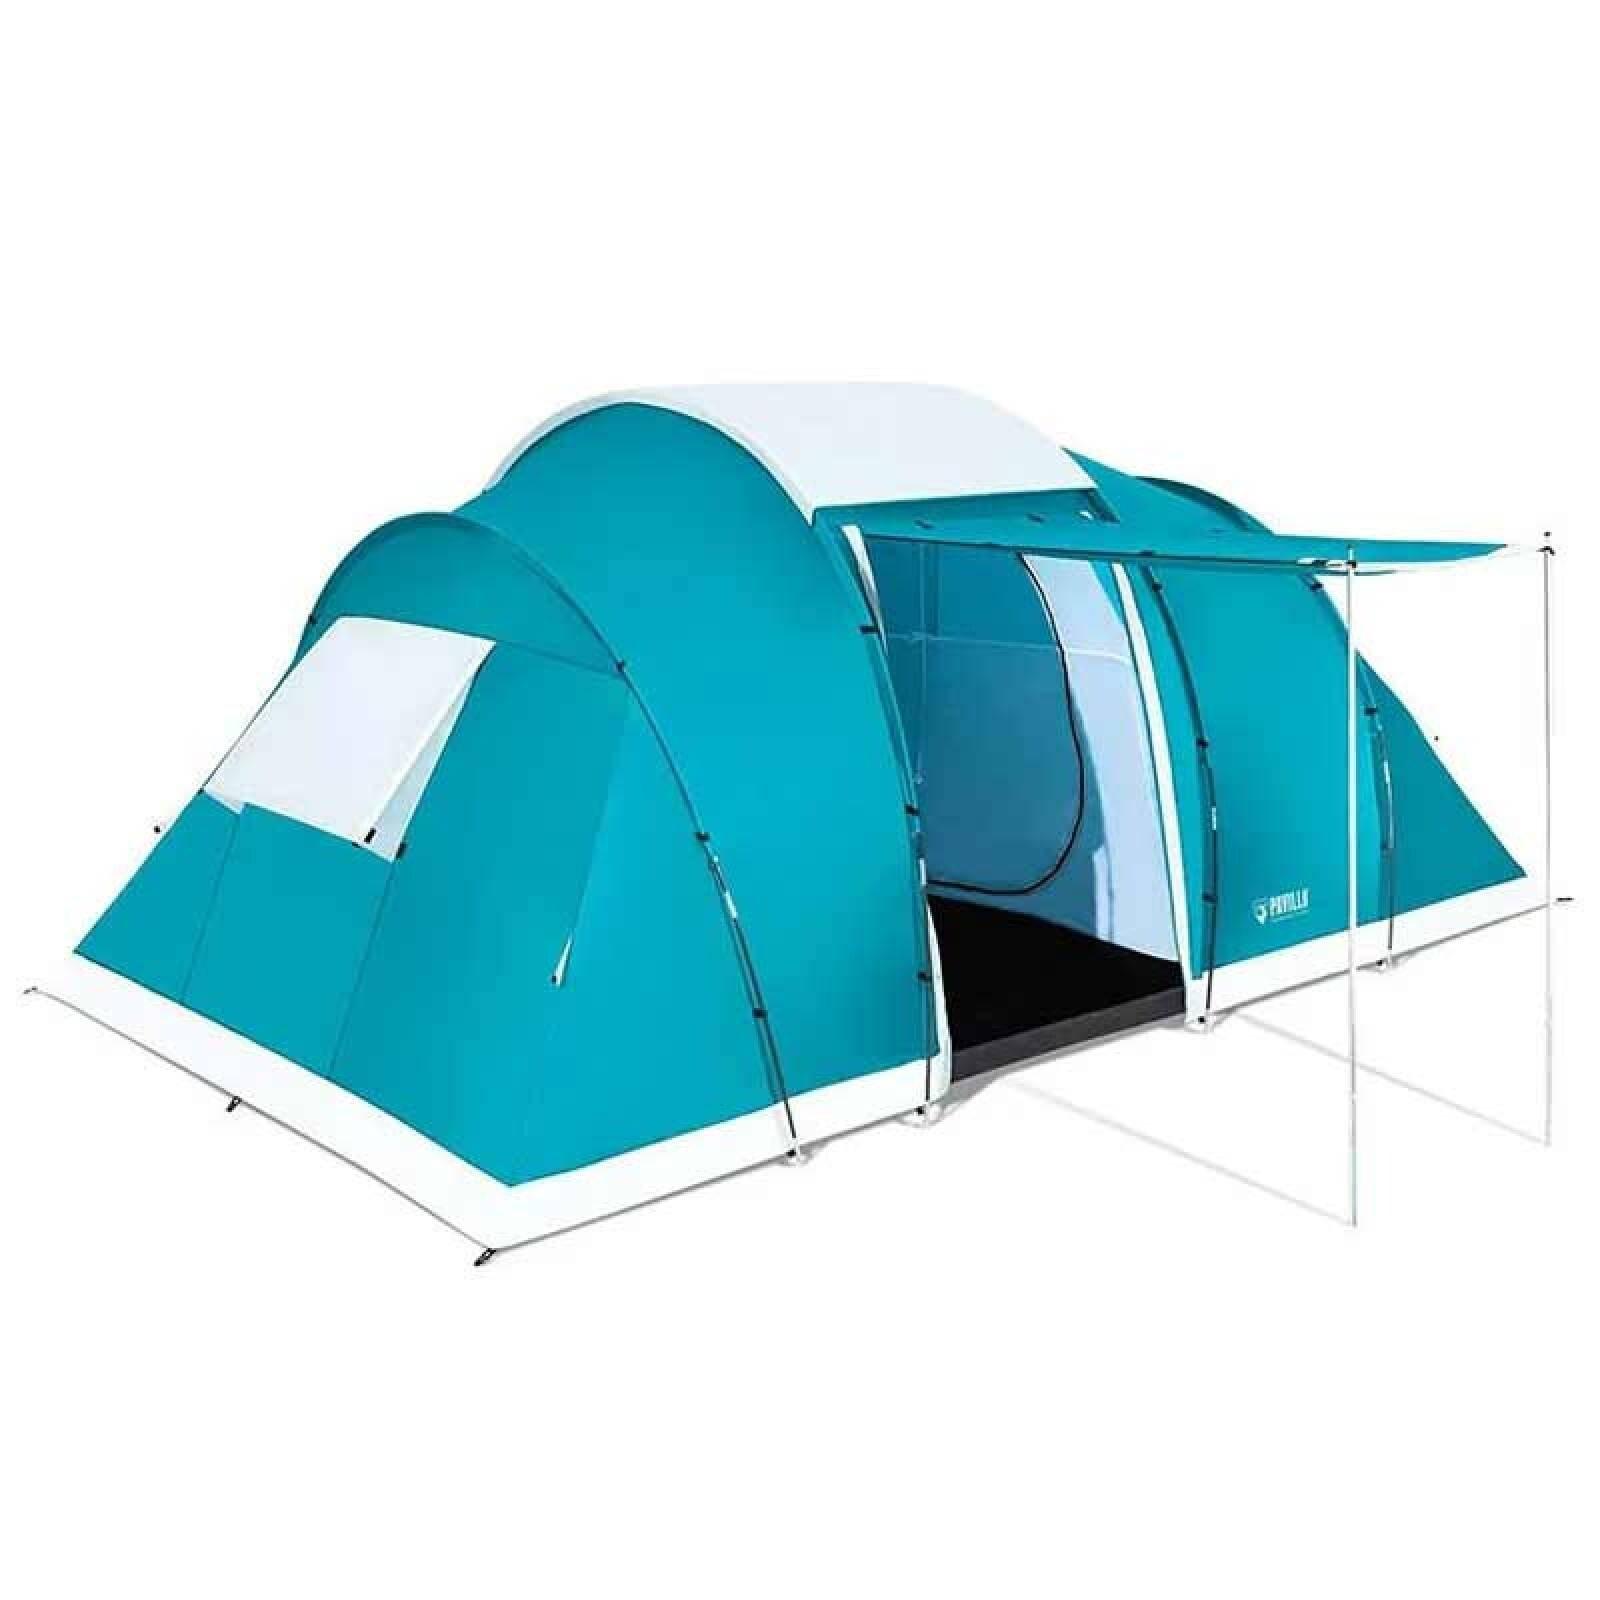 Casa de Campaña 6 Personas Camping Bolsa de Transporte 4.90mx2.80mx2.00m